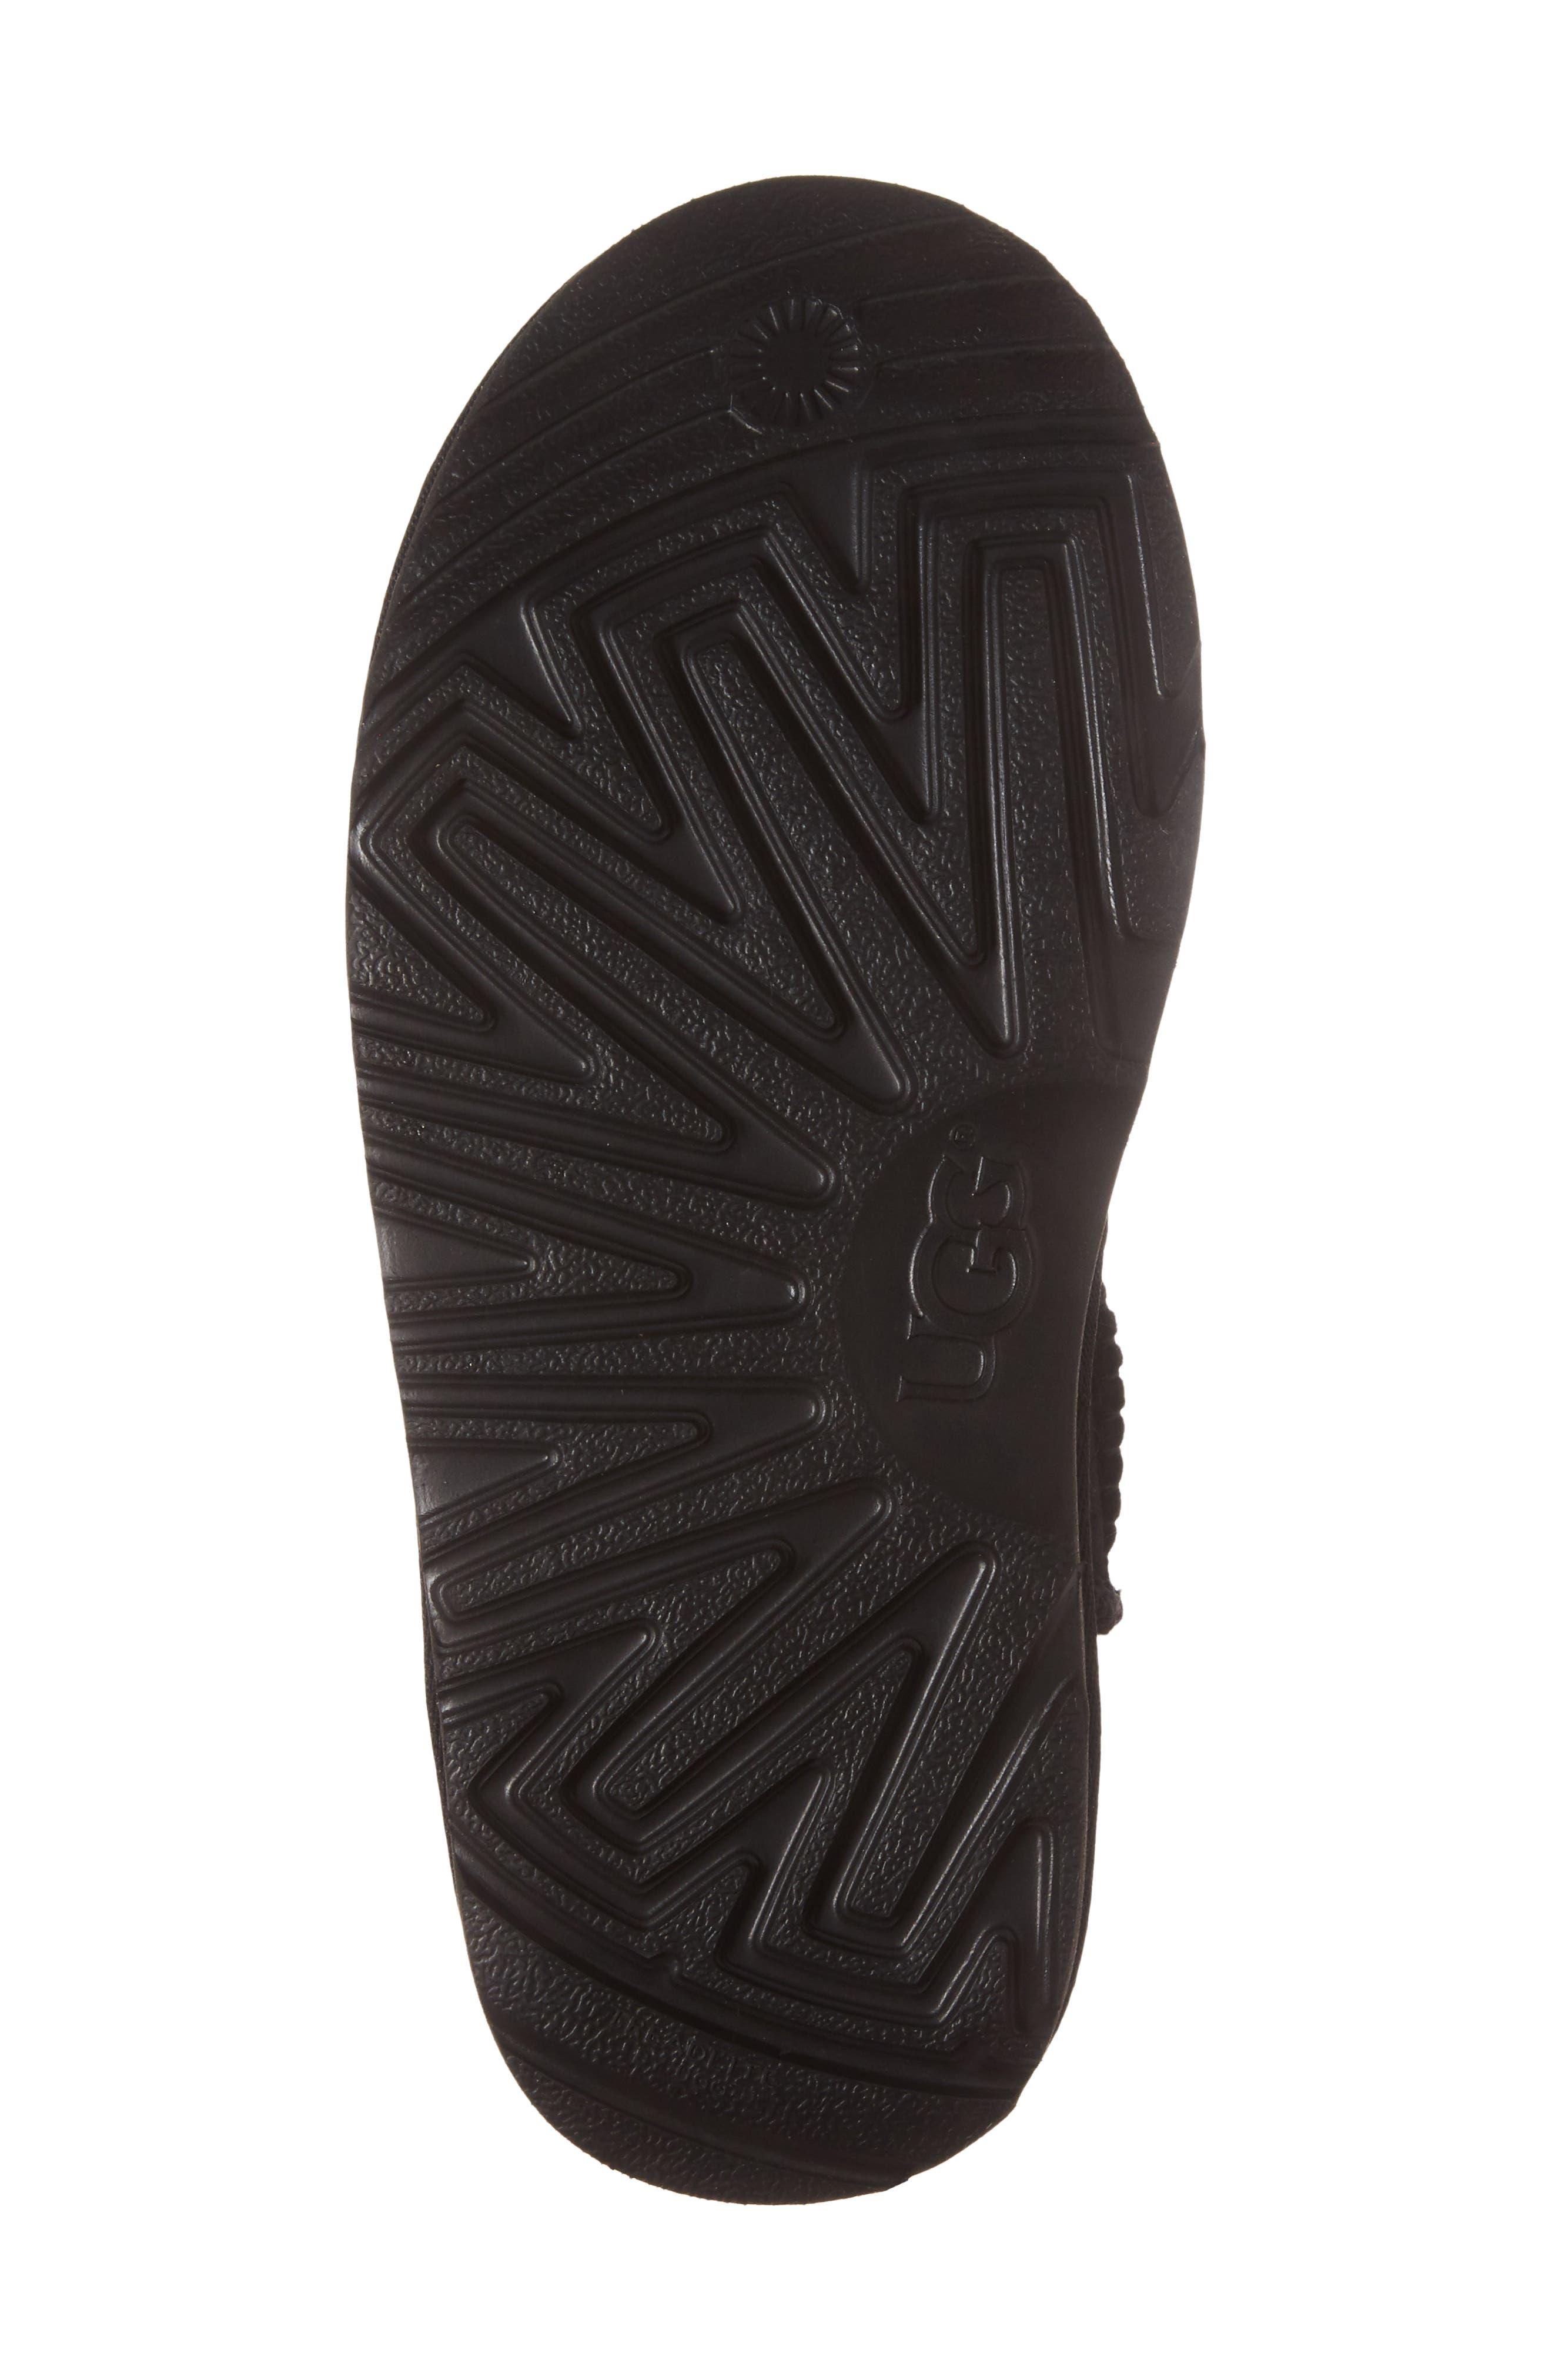 UGG<SUP>®</SUP>, Classic Mini II Water-Resistant Genuine Shearling Boot, Alternate thumbnail 6, color, BLACK